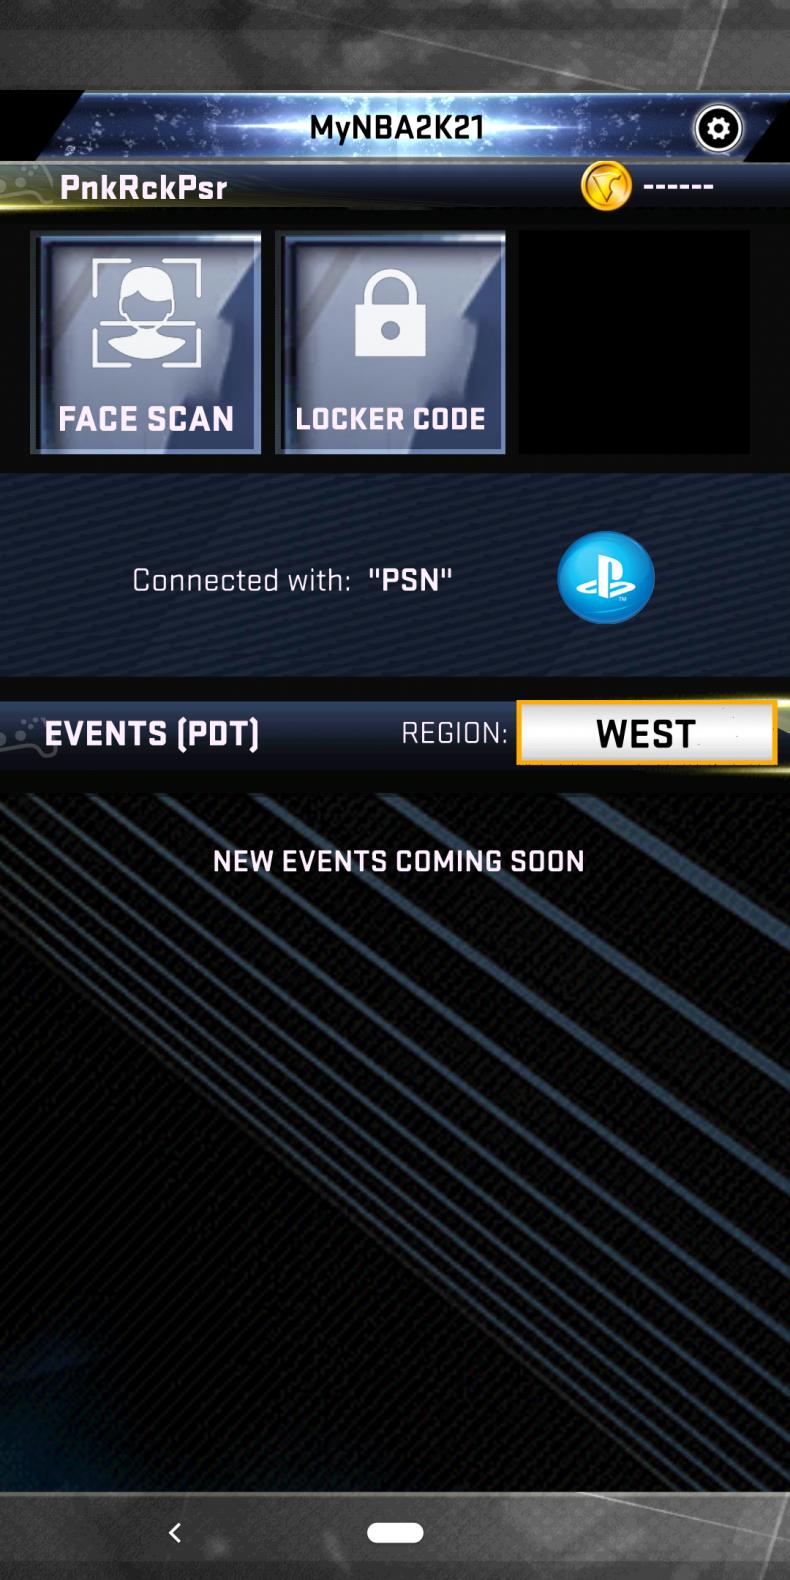 nba 2k21 face scan app